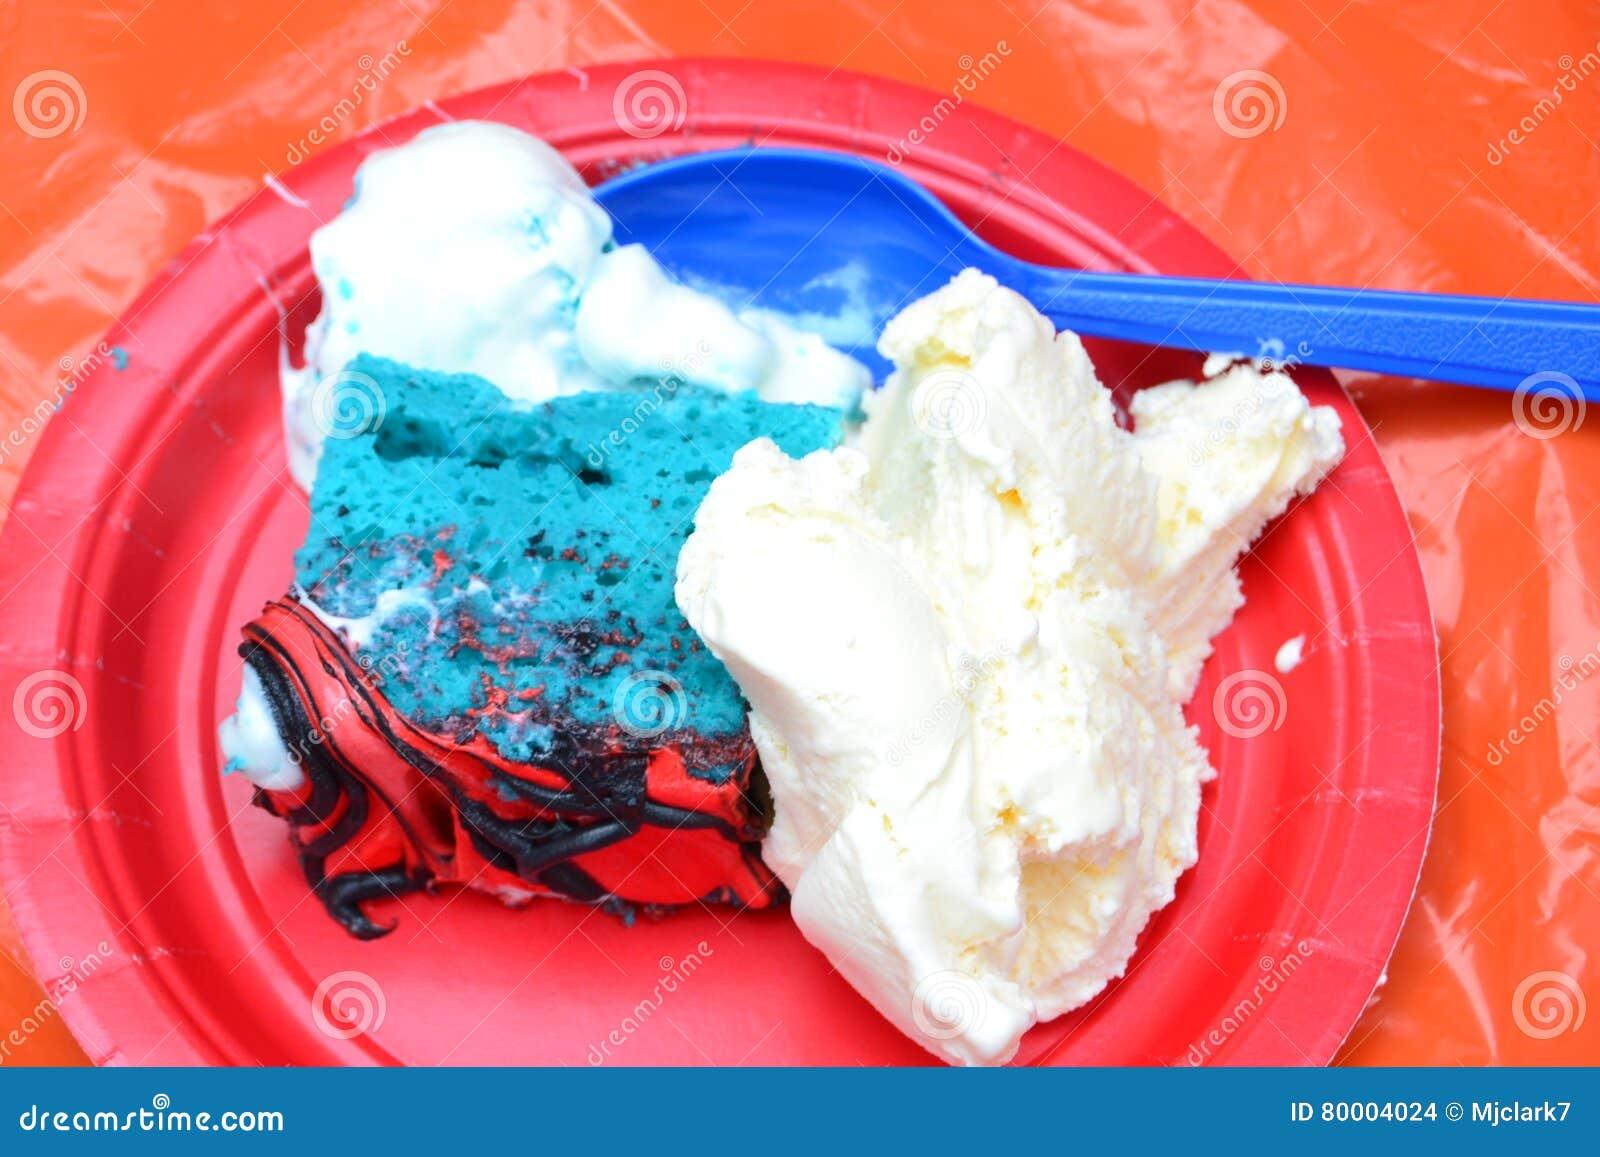 Red White And Blue Birthday Cake And Ice Cream Stock Photo Image